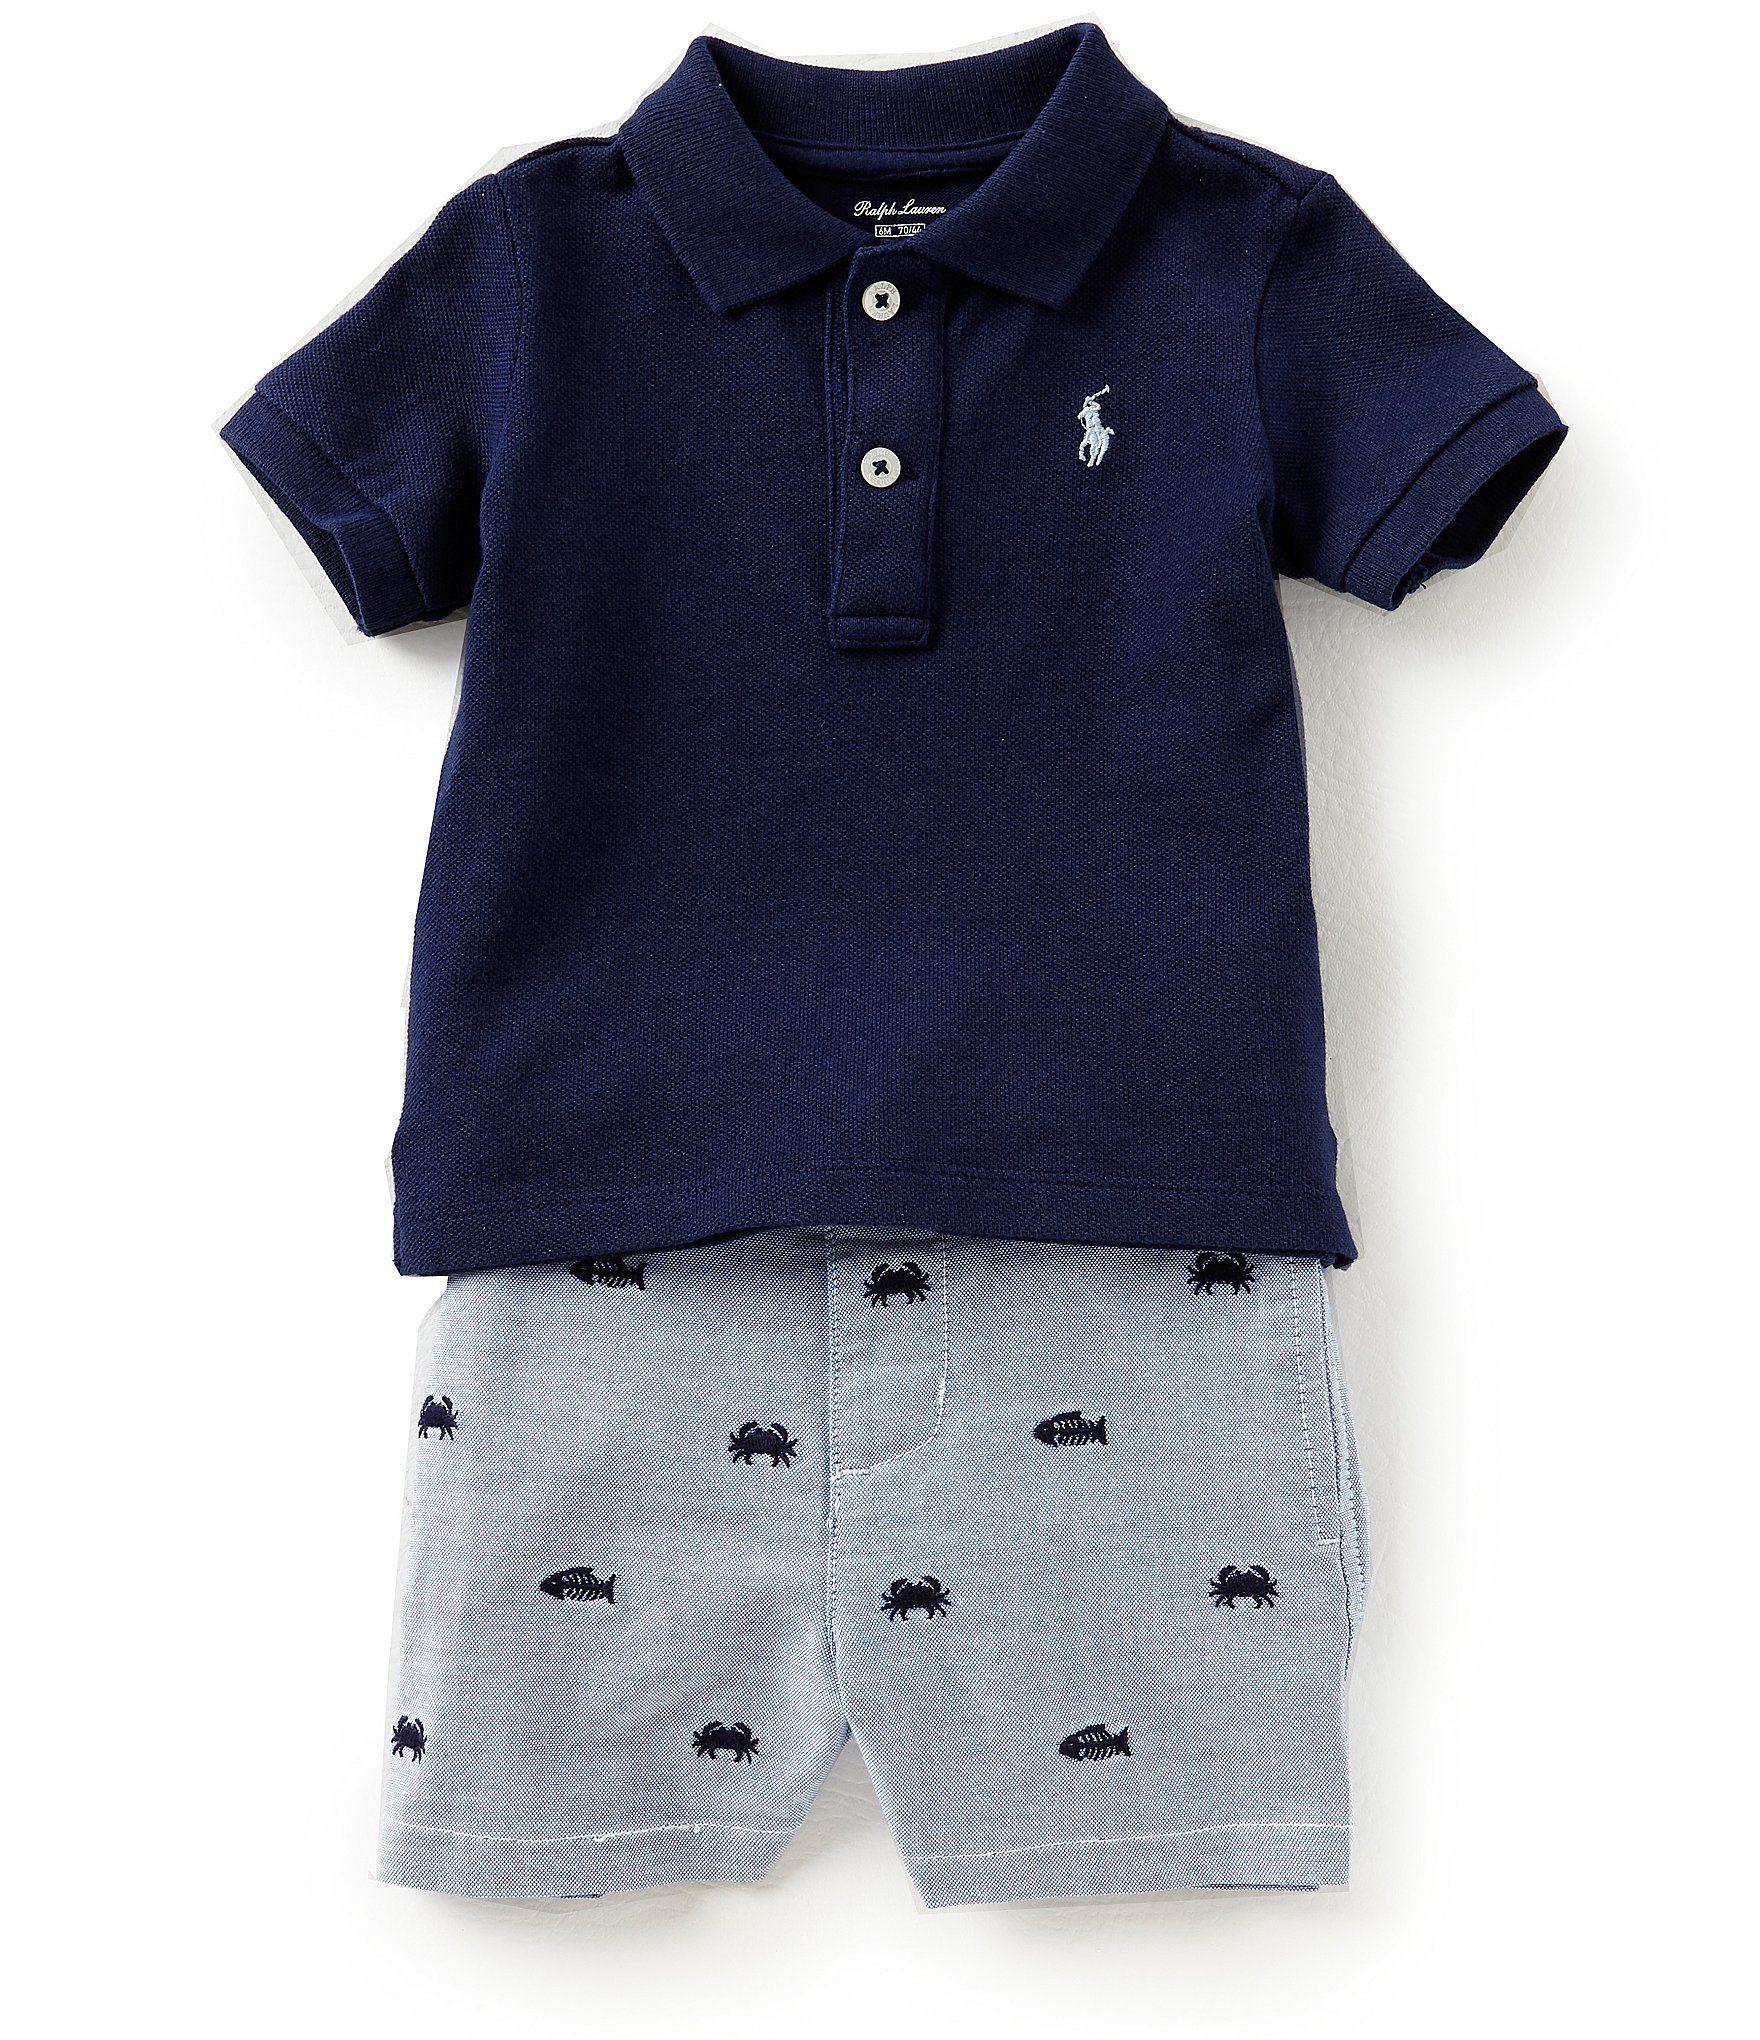 Ralph Lauren Childrenswear Baby Boys 8 Months Solid Polo Shirt